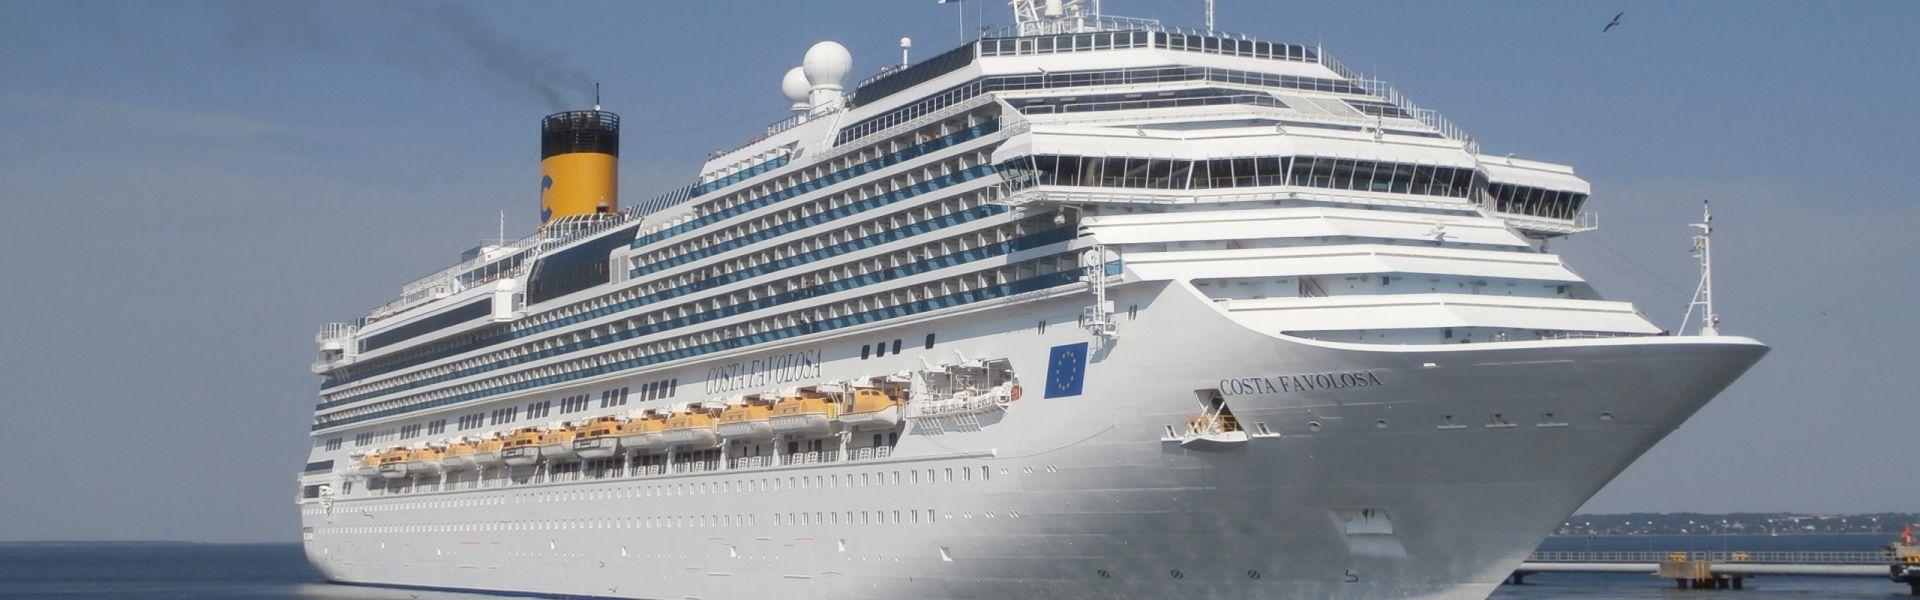 Croaziera 2017 - Mediterana de Vest (Barcelona) - Costa Cruises - Costa Favolosa - 4 nopti